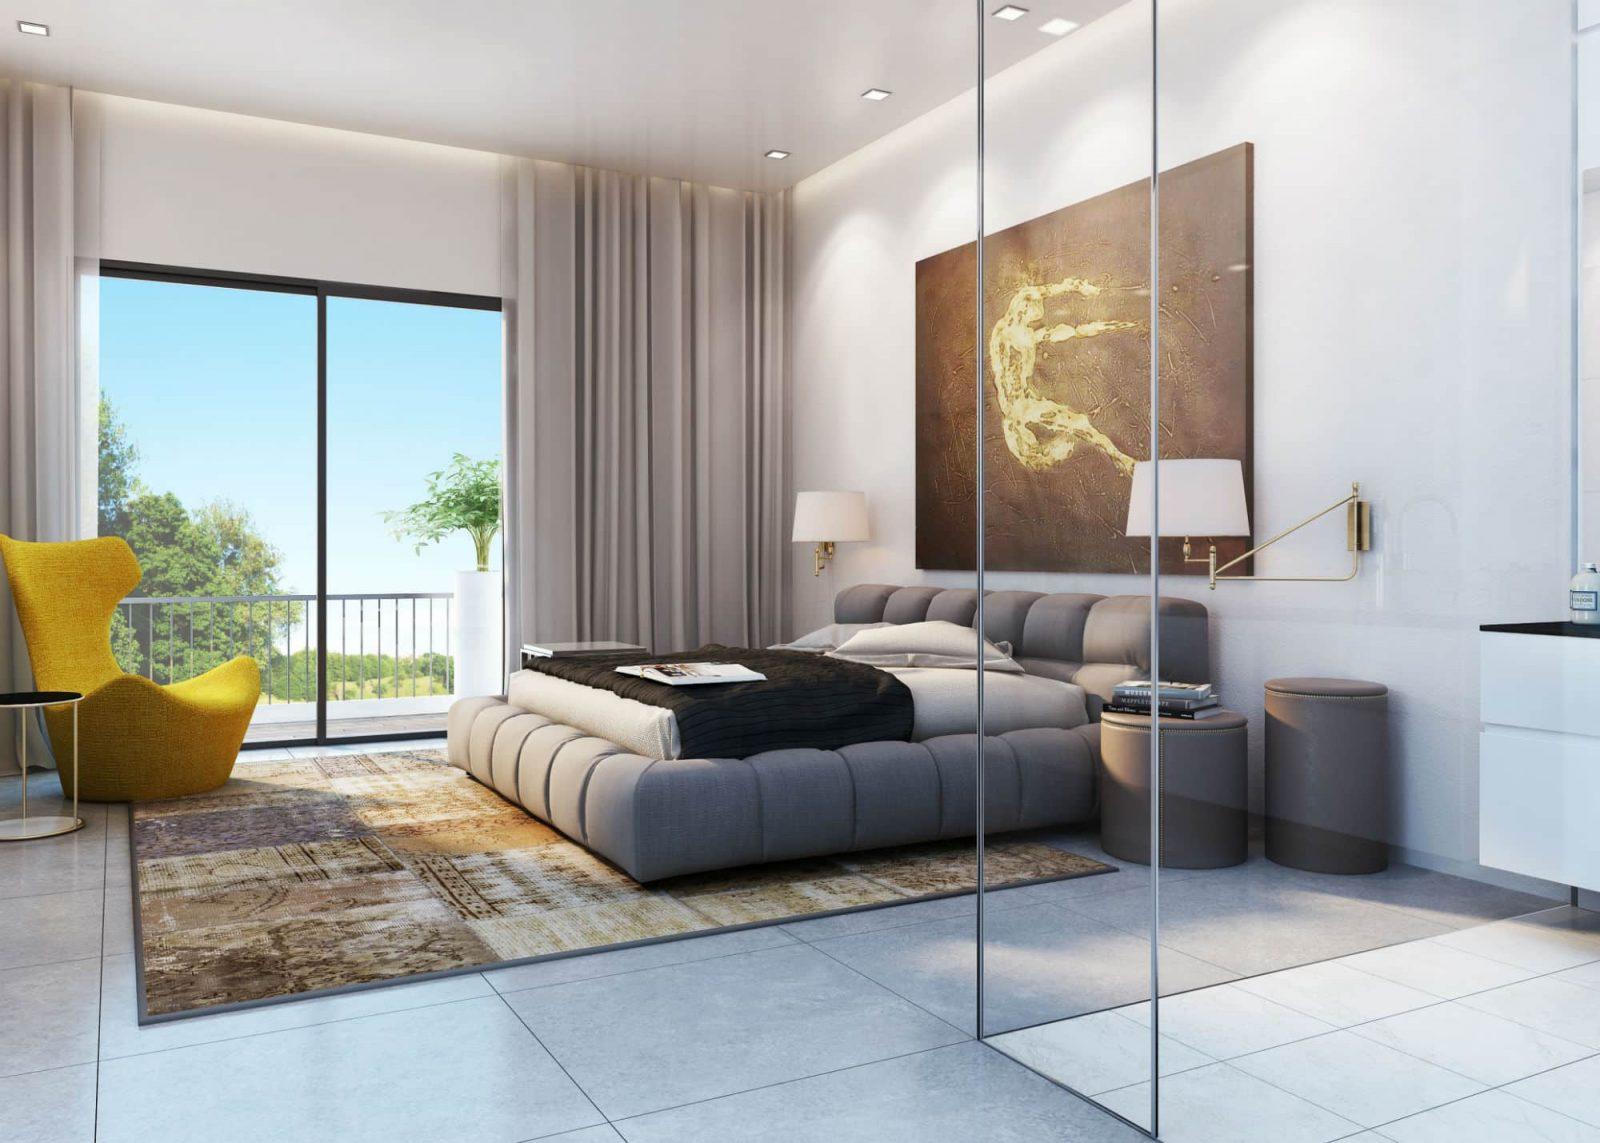 Web3D - הדמיות אדריכלות - אילוסטרציה של חדר שינה